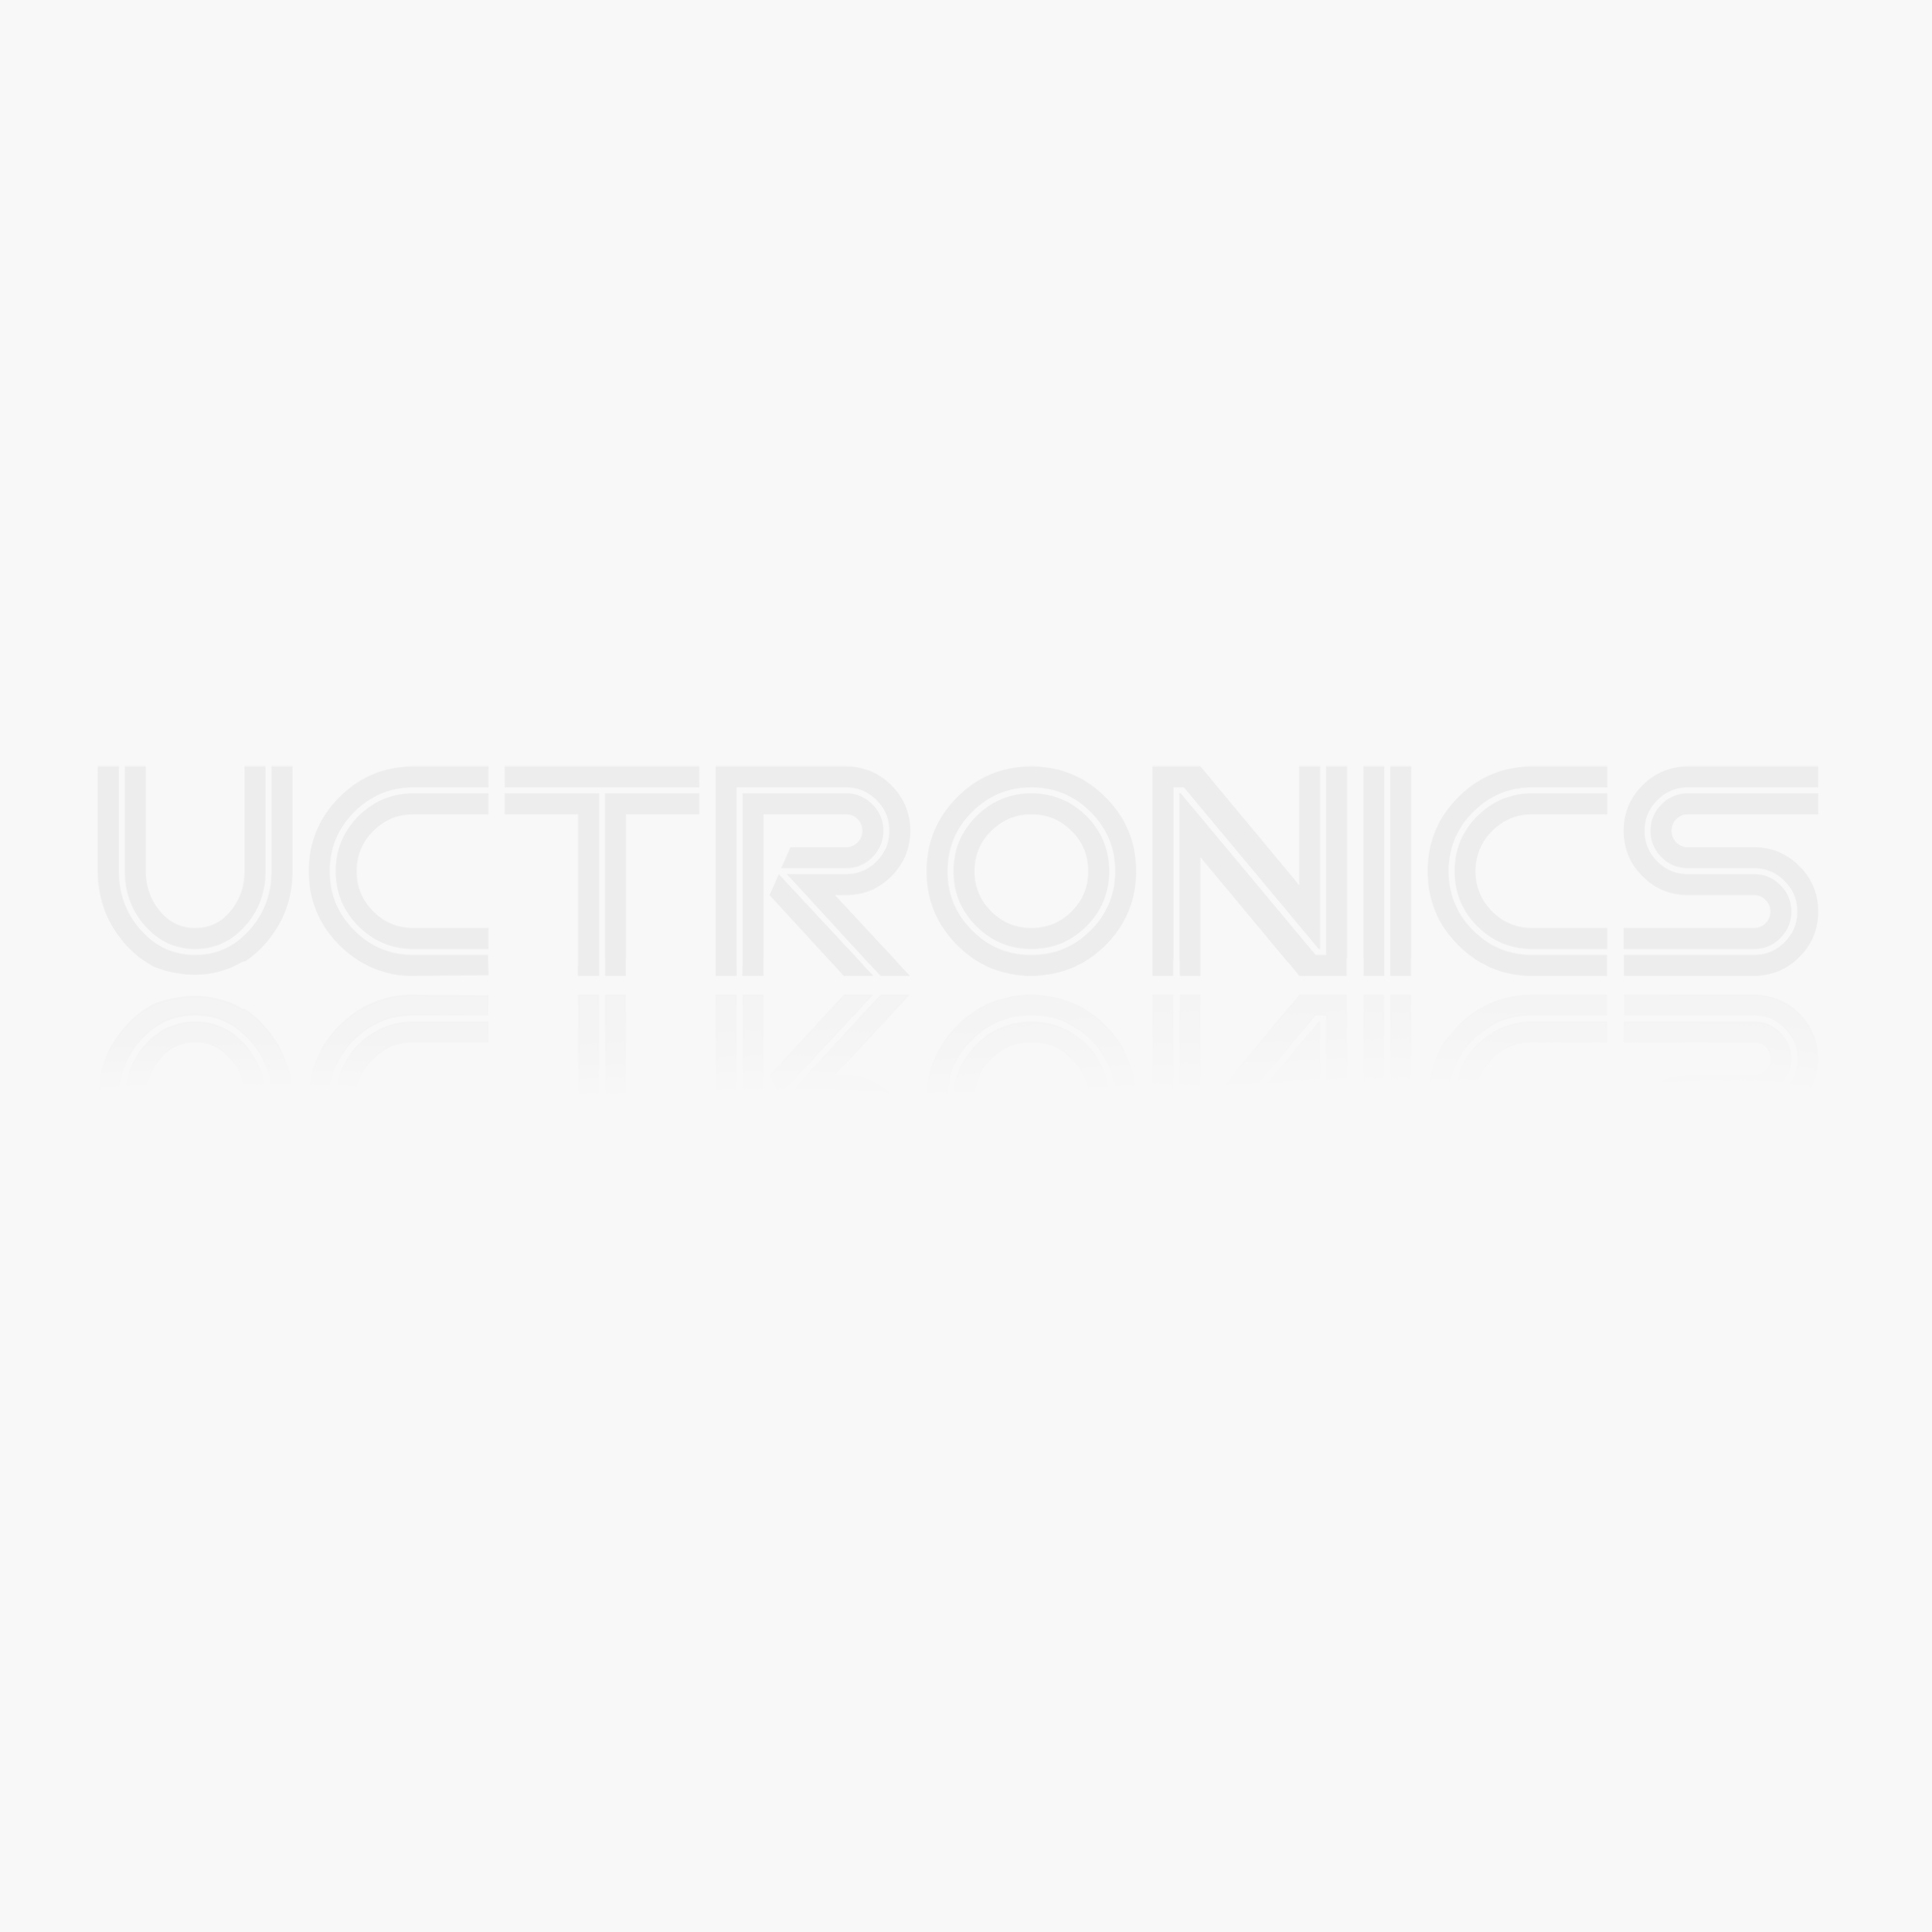 10sets KF2510 4Pin Connector Kits 2.54mm Male Pin Header+Terminal+Female